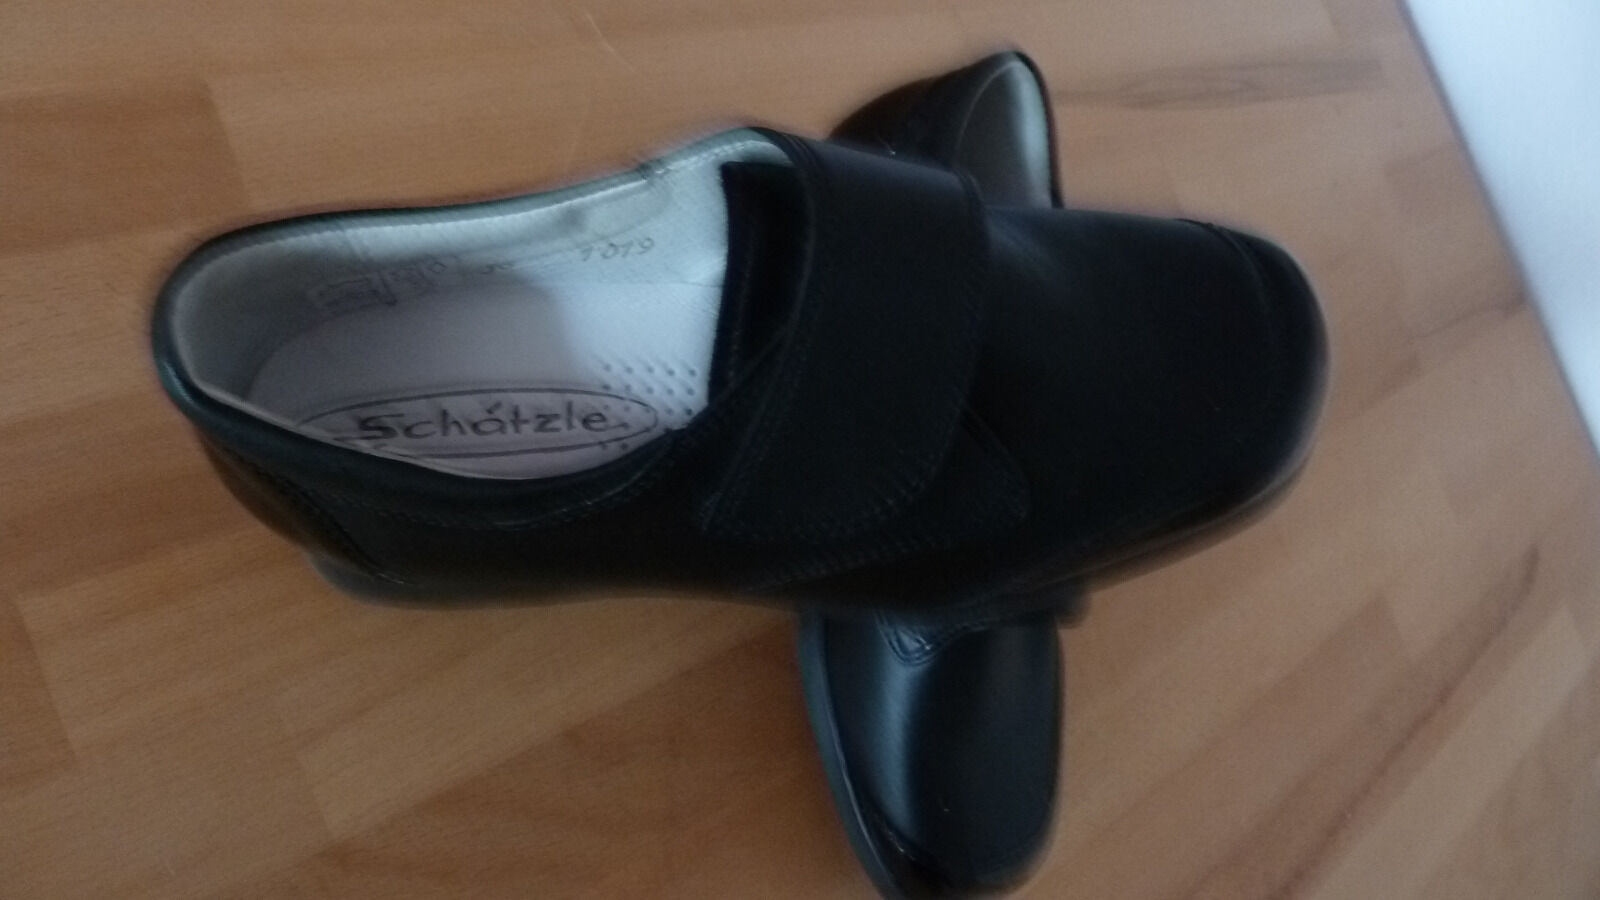 Damenschuhe - Halbschuhe, Gr.36, schwarz, Schätzle